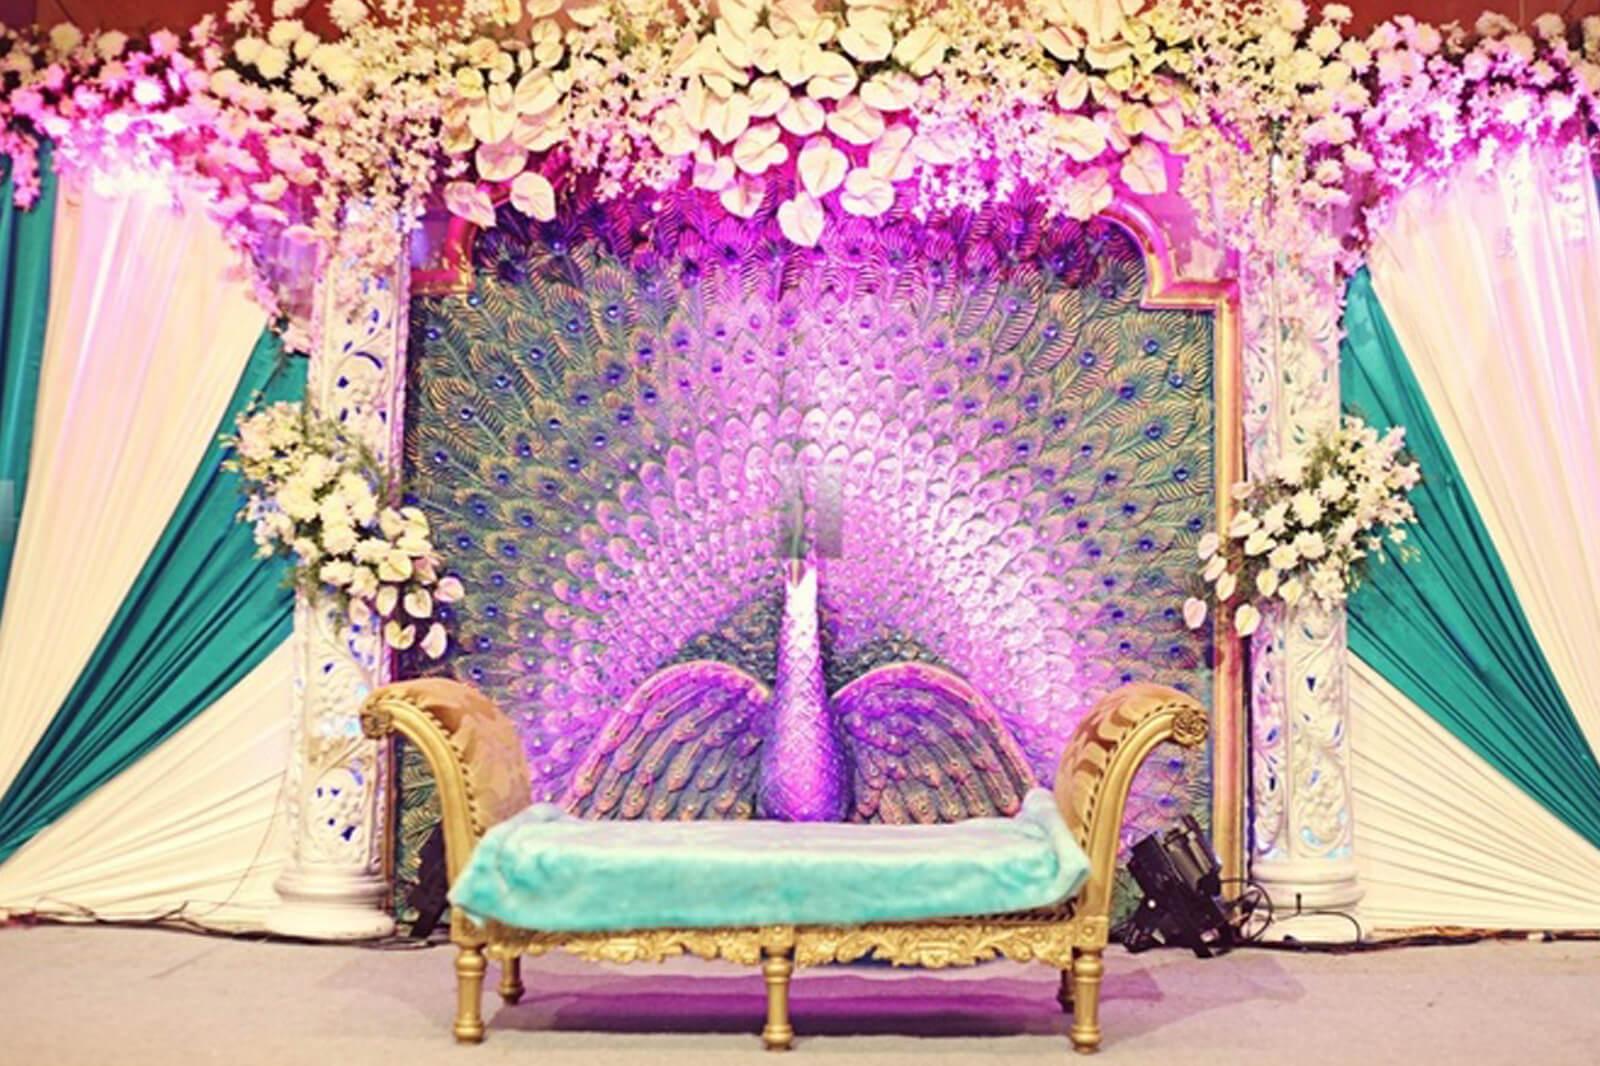 10 creative indian wedding decoration ideas wedding decoration Indian wedding decorations